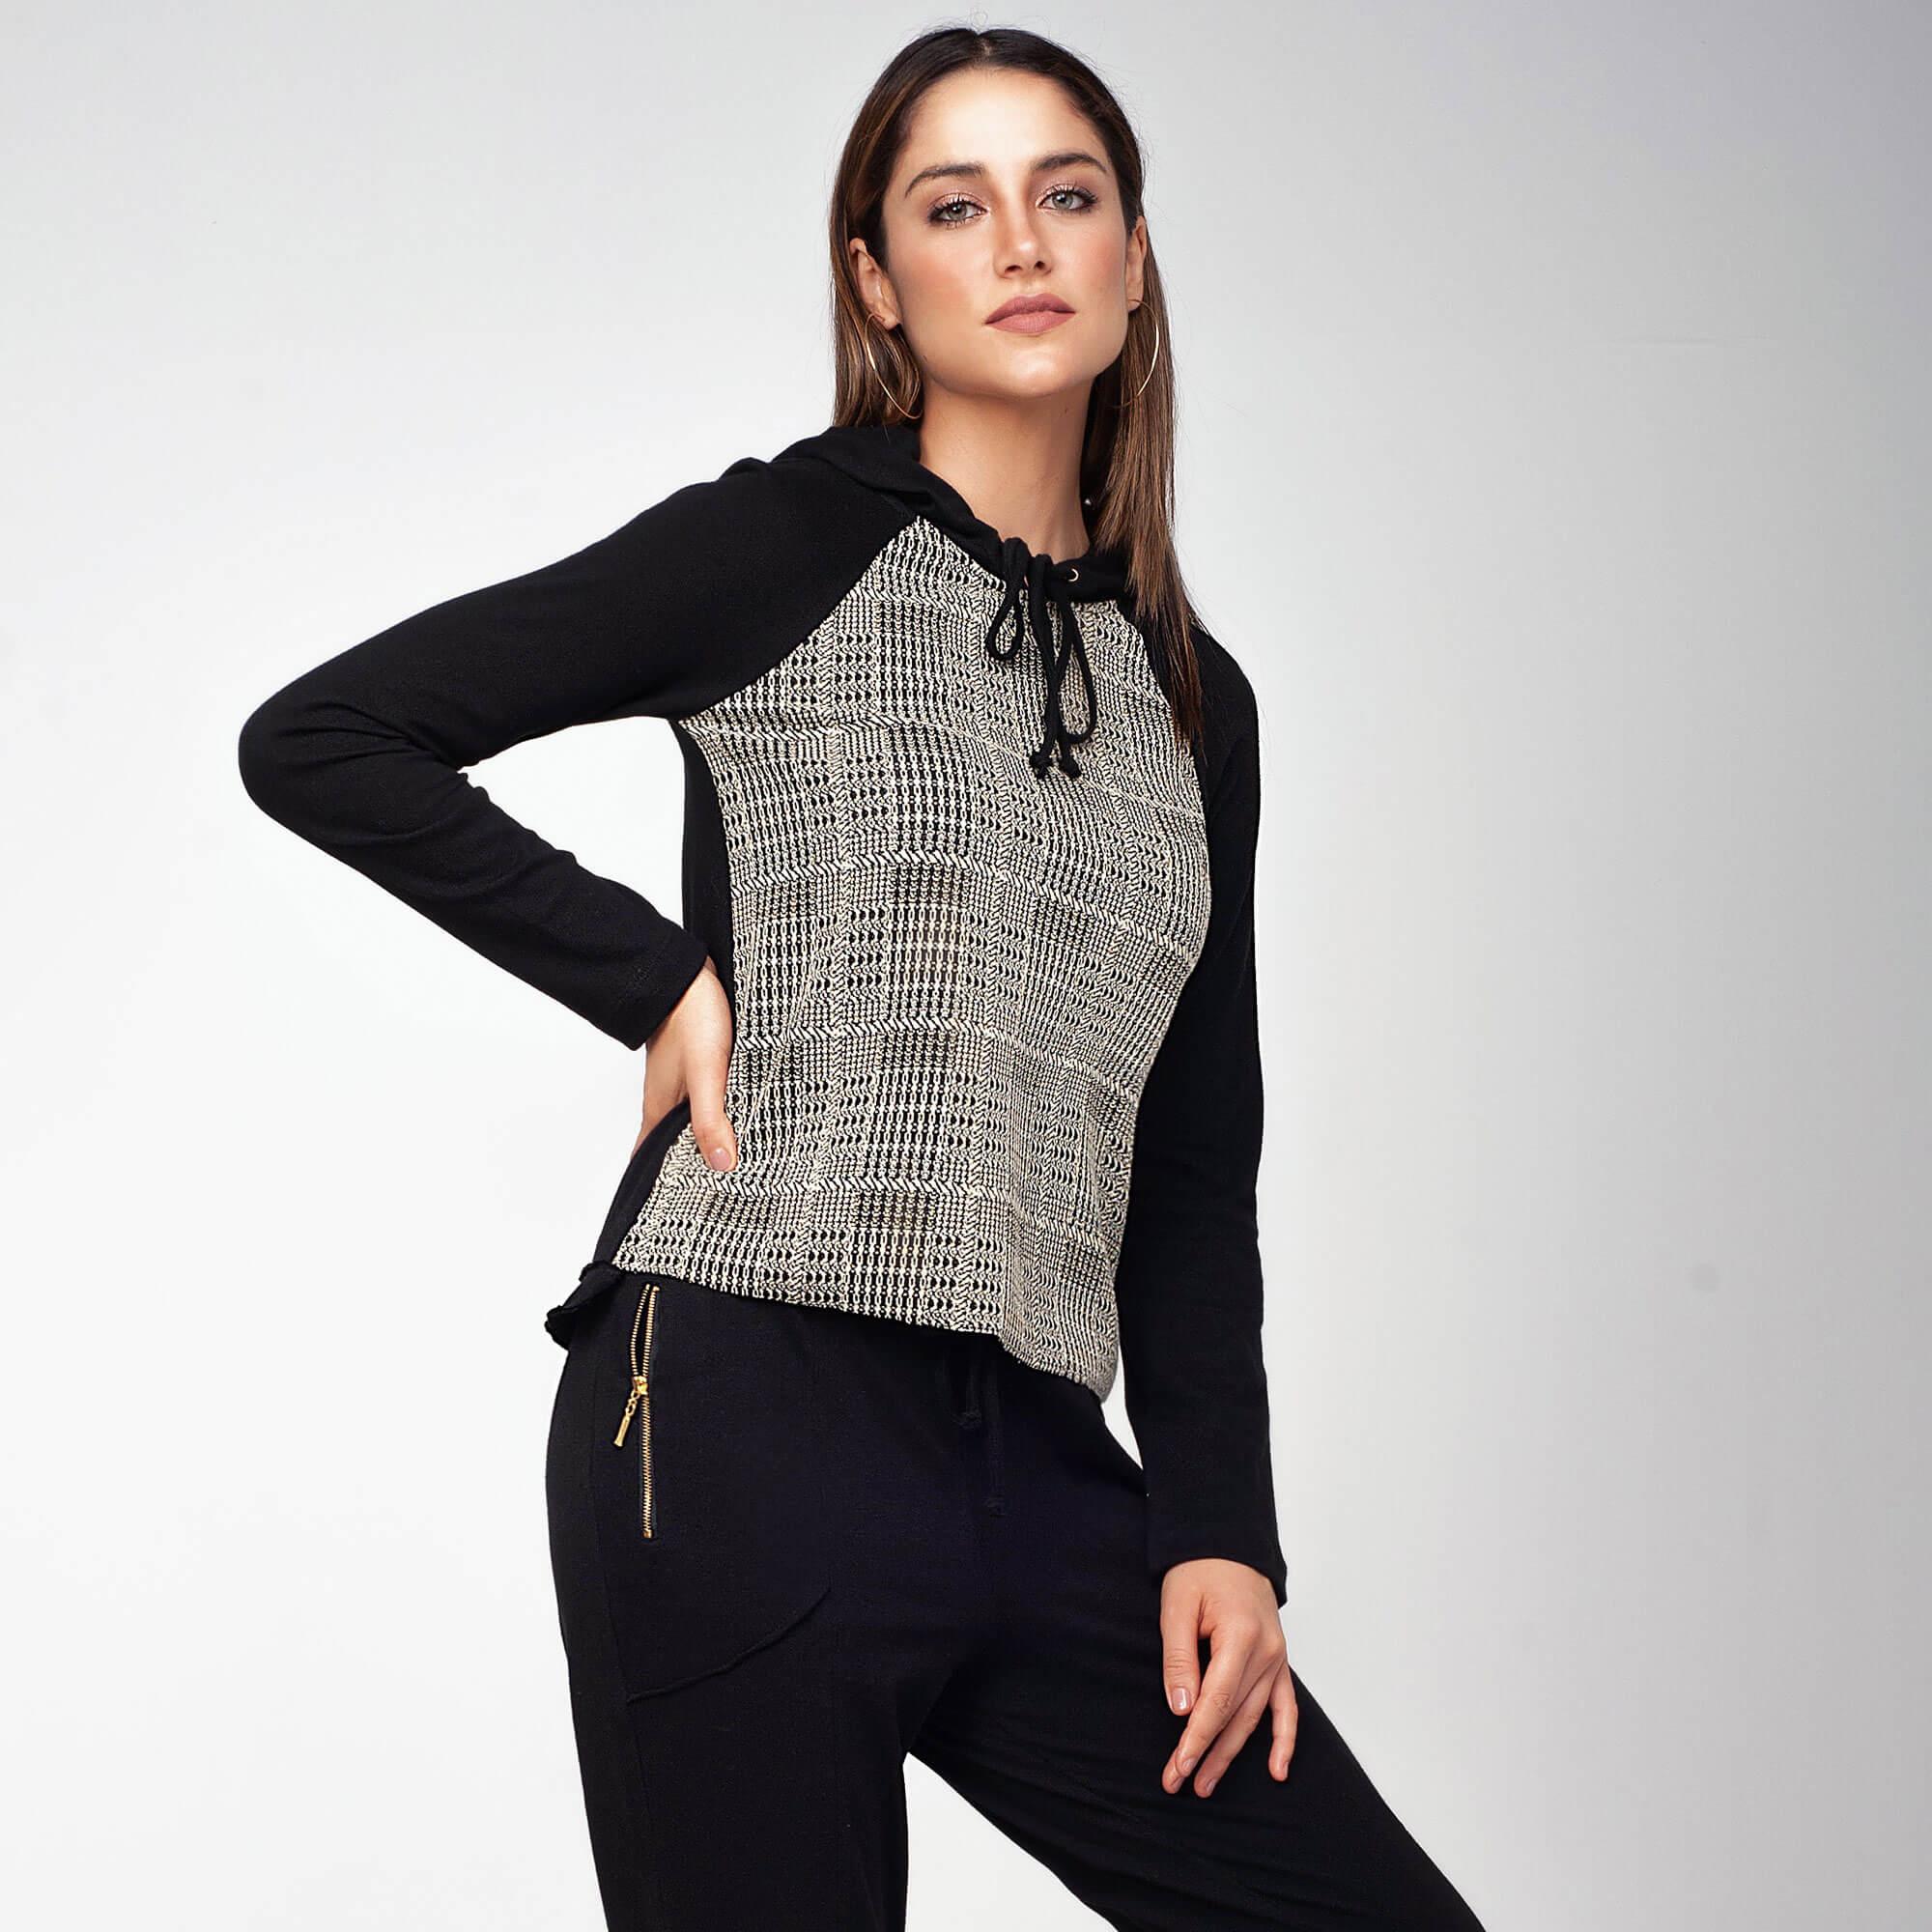 Blusa Malha c/ Detalhe Frente